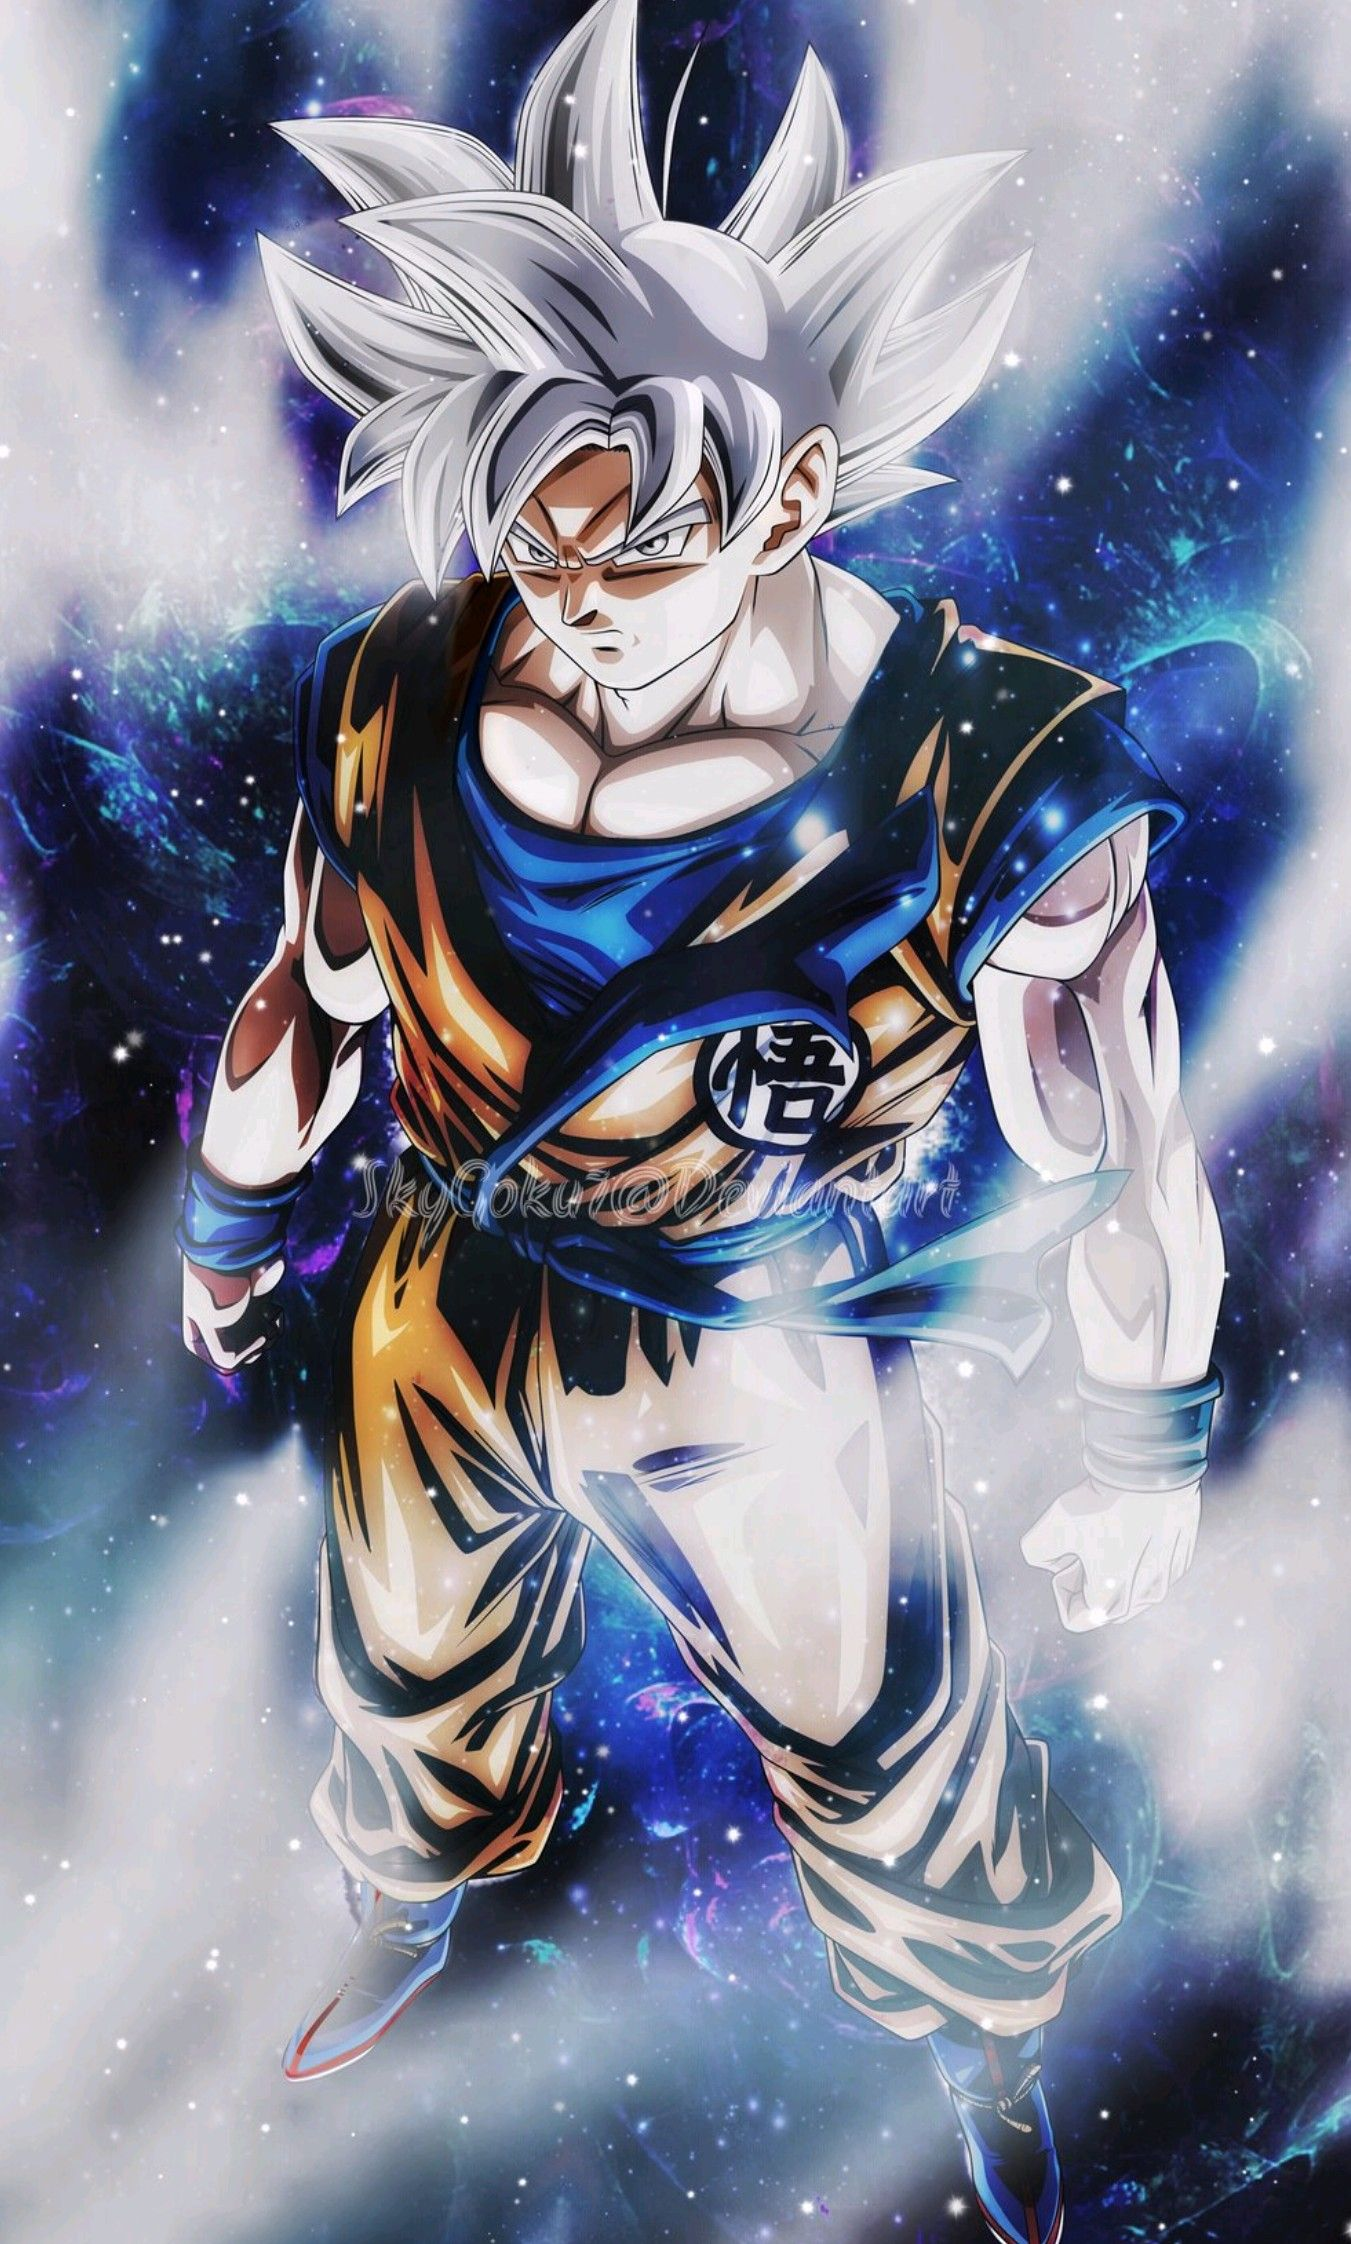 Goku Ultra Instinct Mastered Dragon Ball Super Personajes De Dragon Ball Personajes De Goku Dragon Ball Gt